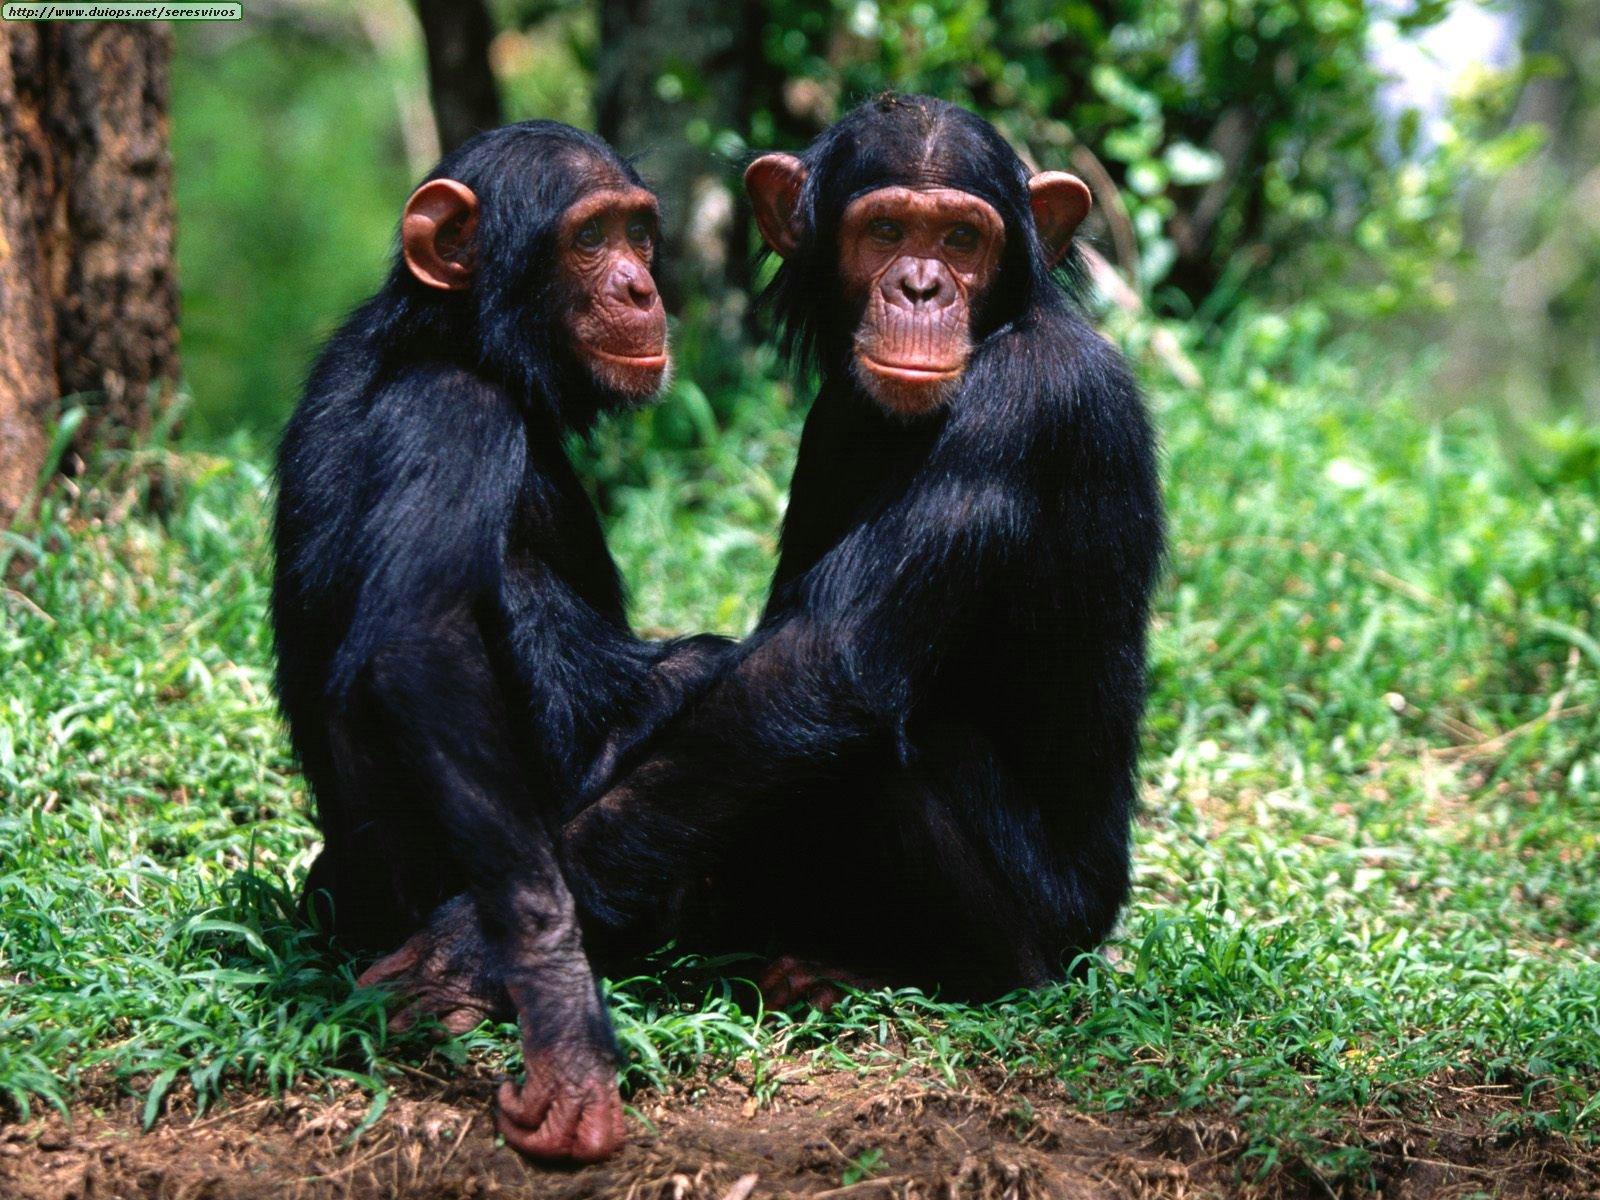 http://1.bp.blogspot.com/-9eeI7n8dteM/UBklutmMMbI/AAAAAAAAFYs/N24xLVDucLU/s1600/Chimpanzees+wallpapers+2.jpg